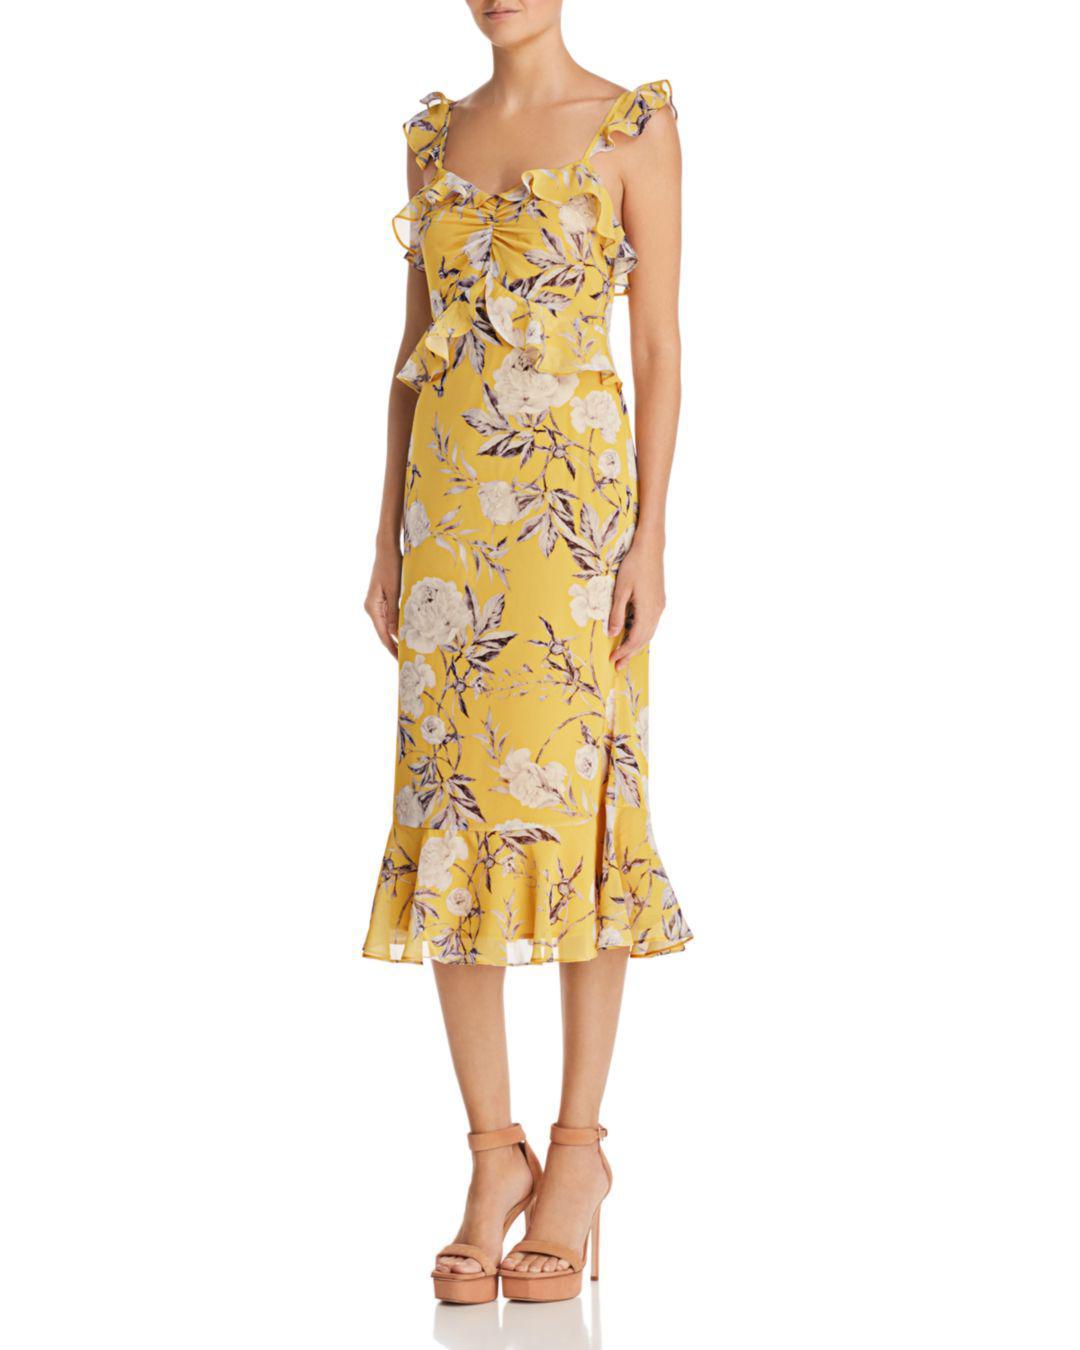 2bfee3e58f Lucy Paris Marissa Ruffled Floral Midi Dress in Yellow - Lyst